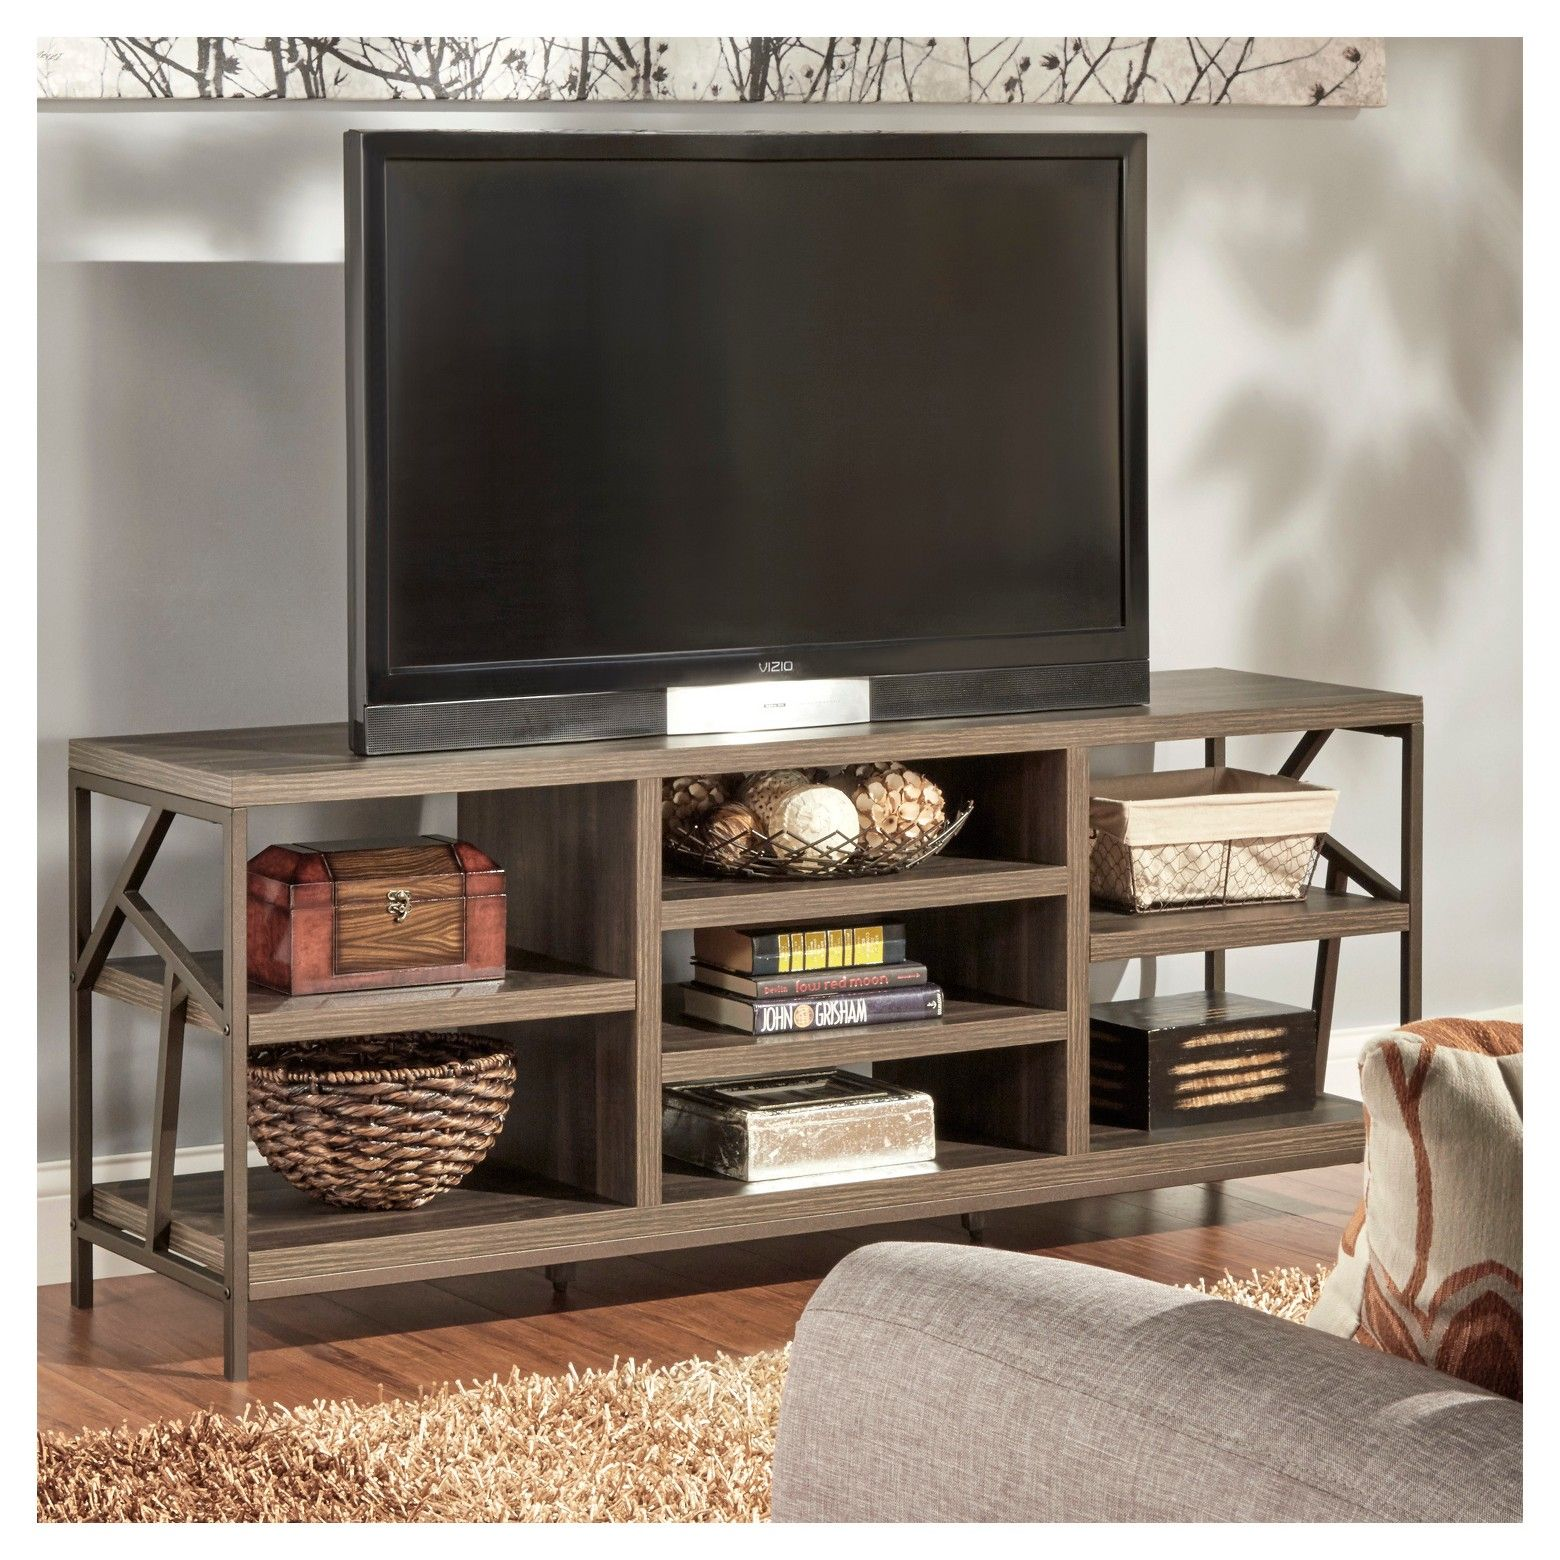 Logan Geometric Cutout Side TV Stand Brown - Inspire Q